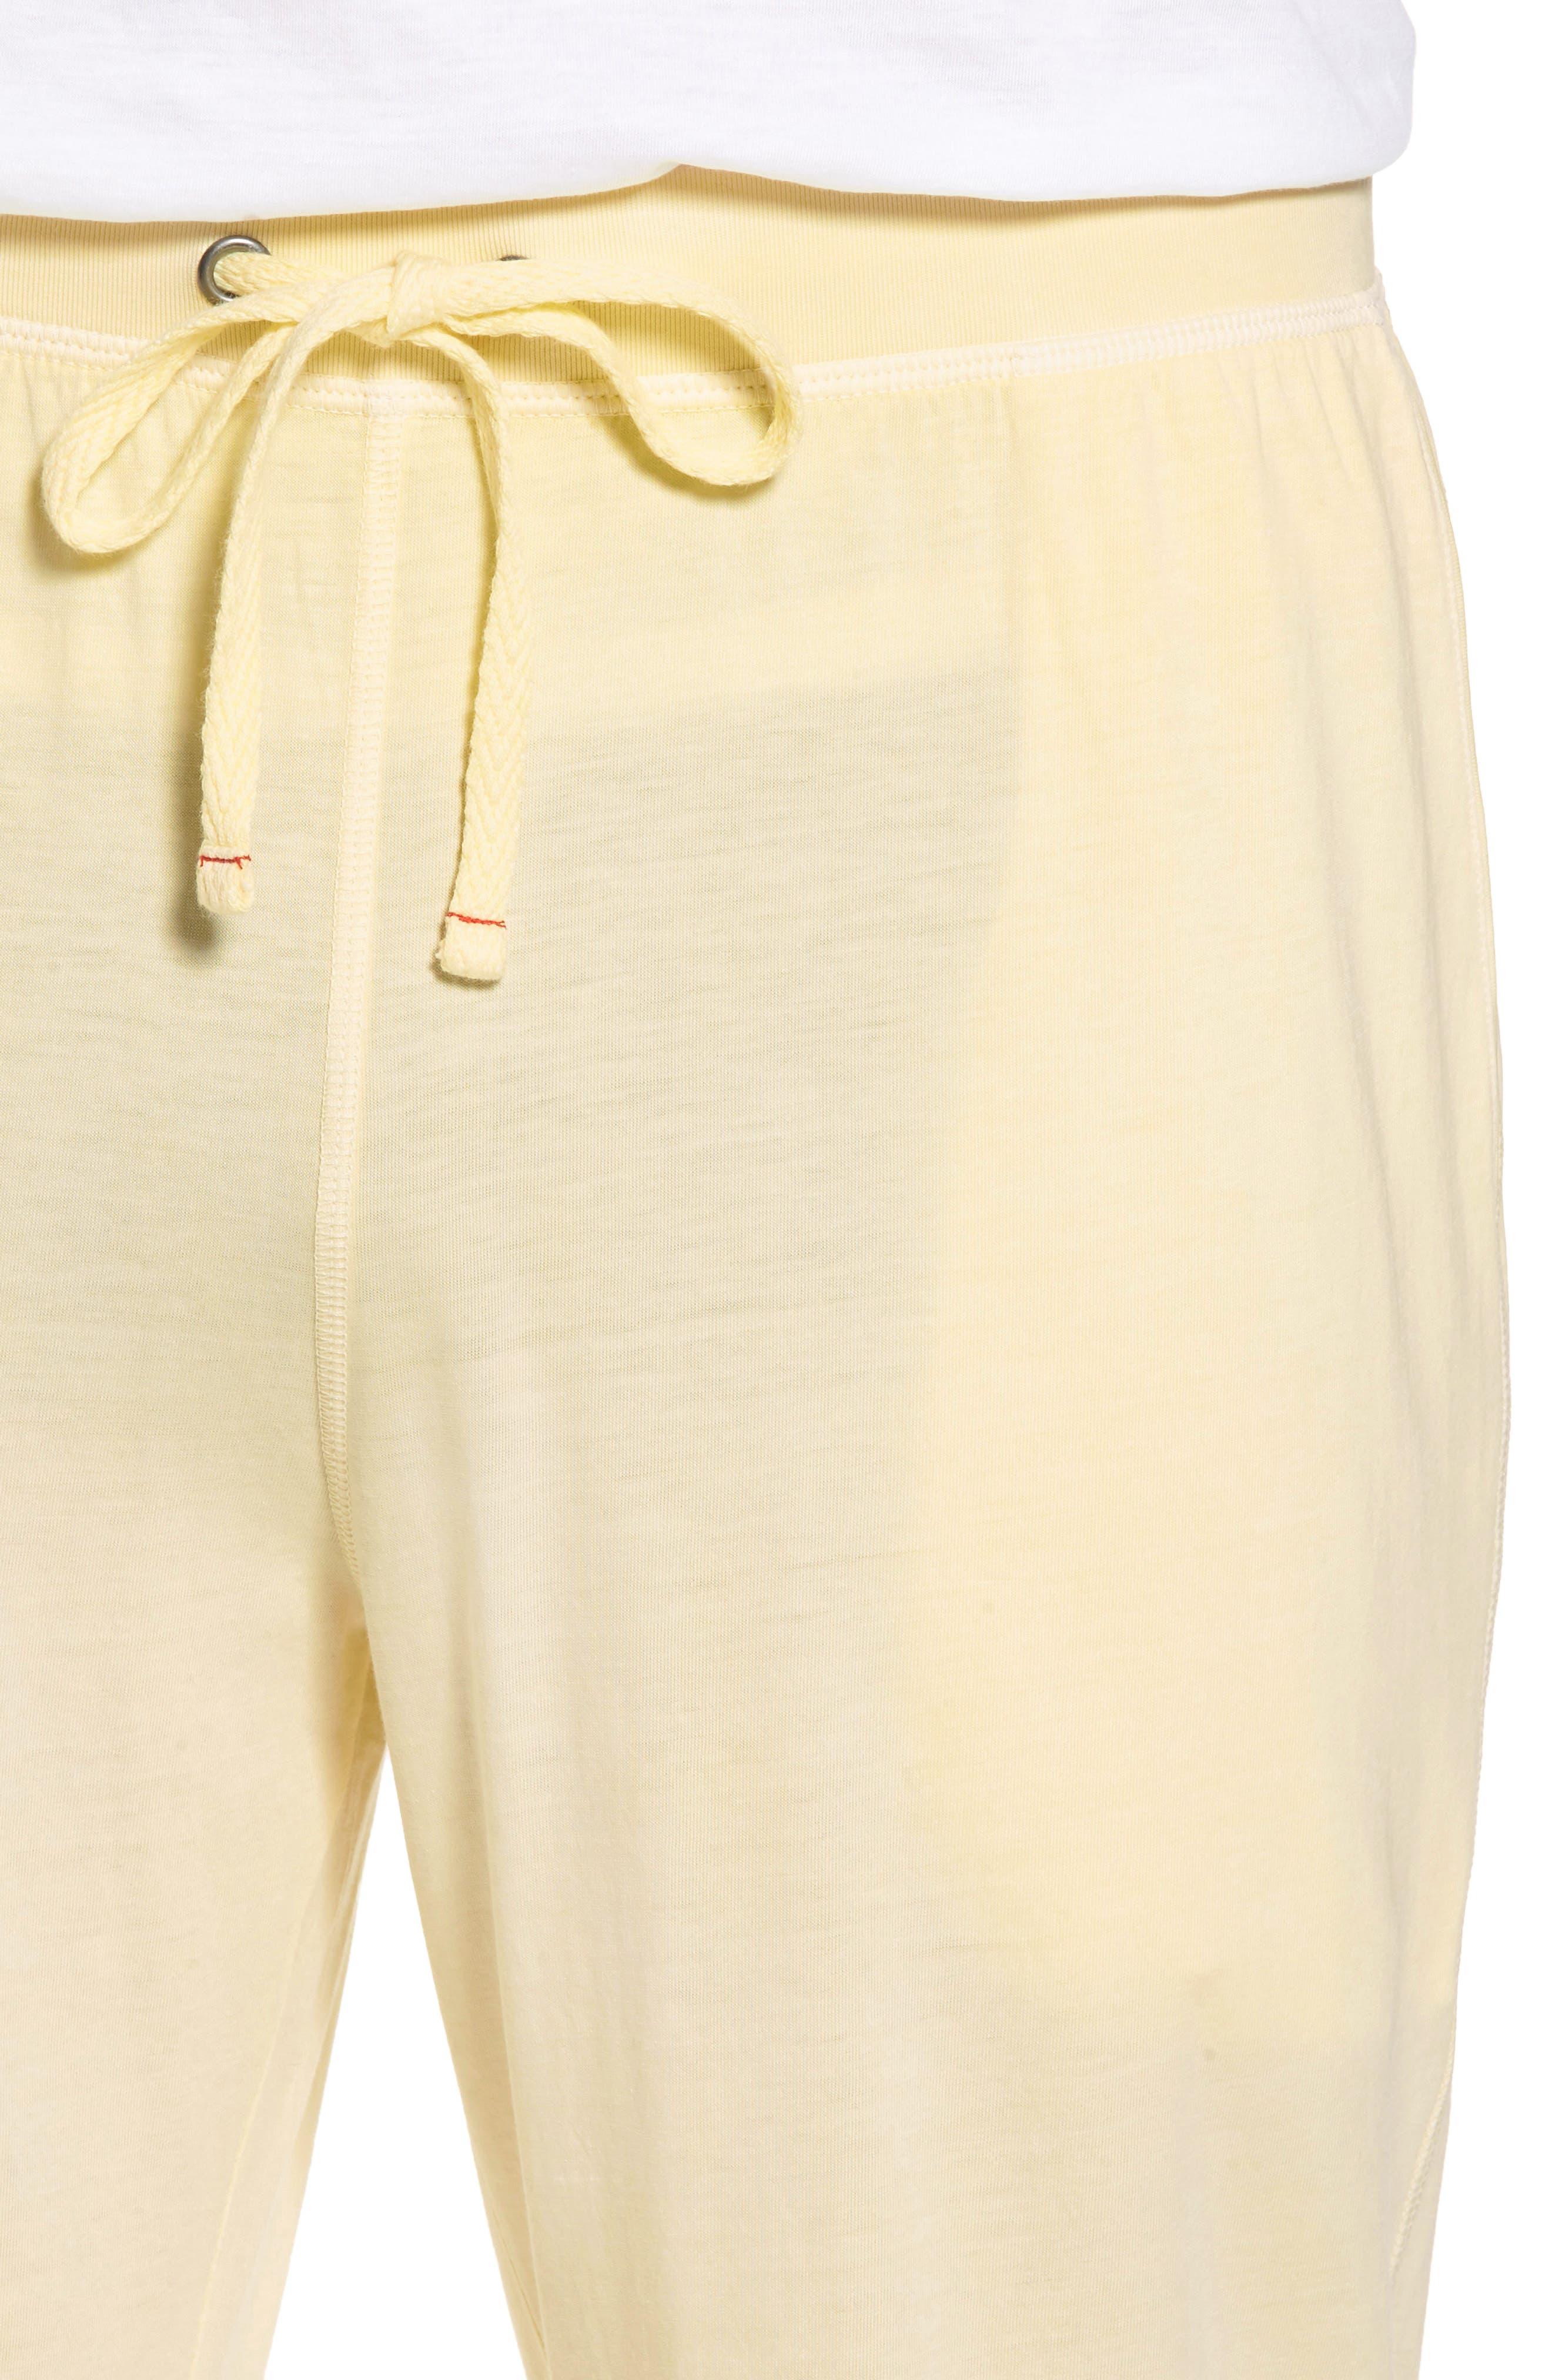 Peruvian Pima Cotton Lounge Pants,                             Alternate thumbnail 4, color,                             YELLOW